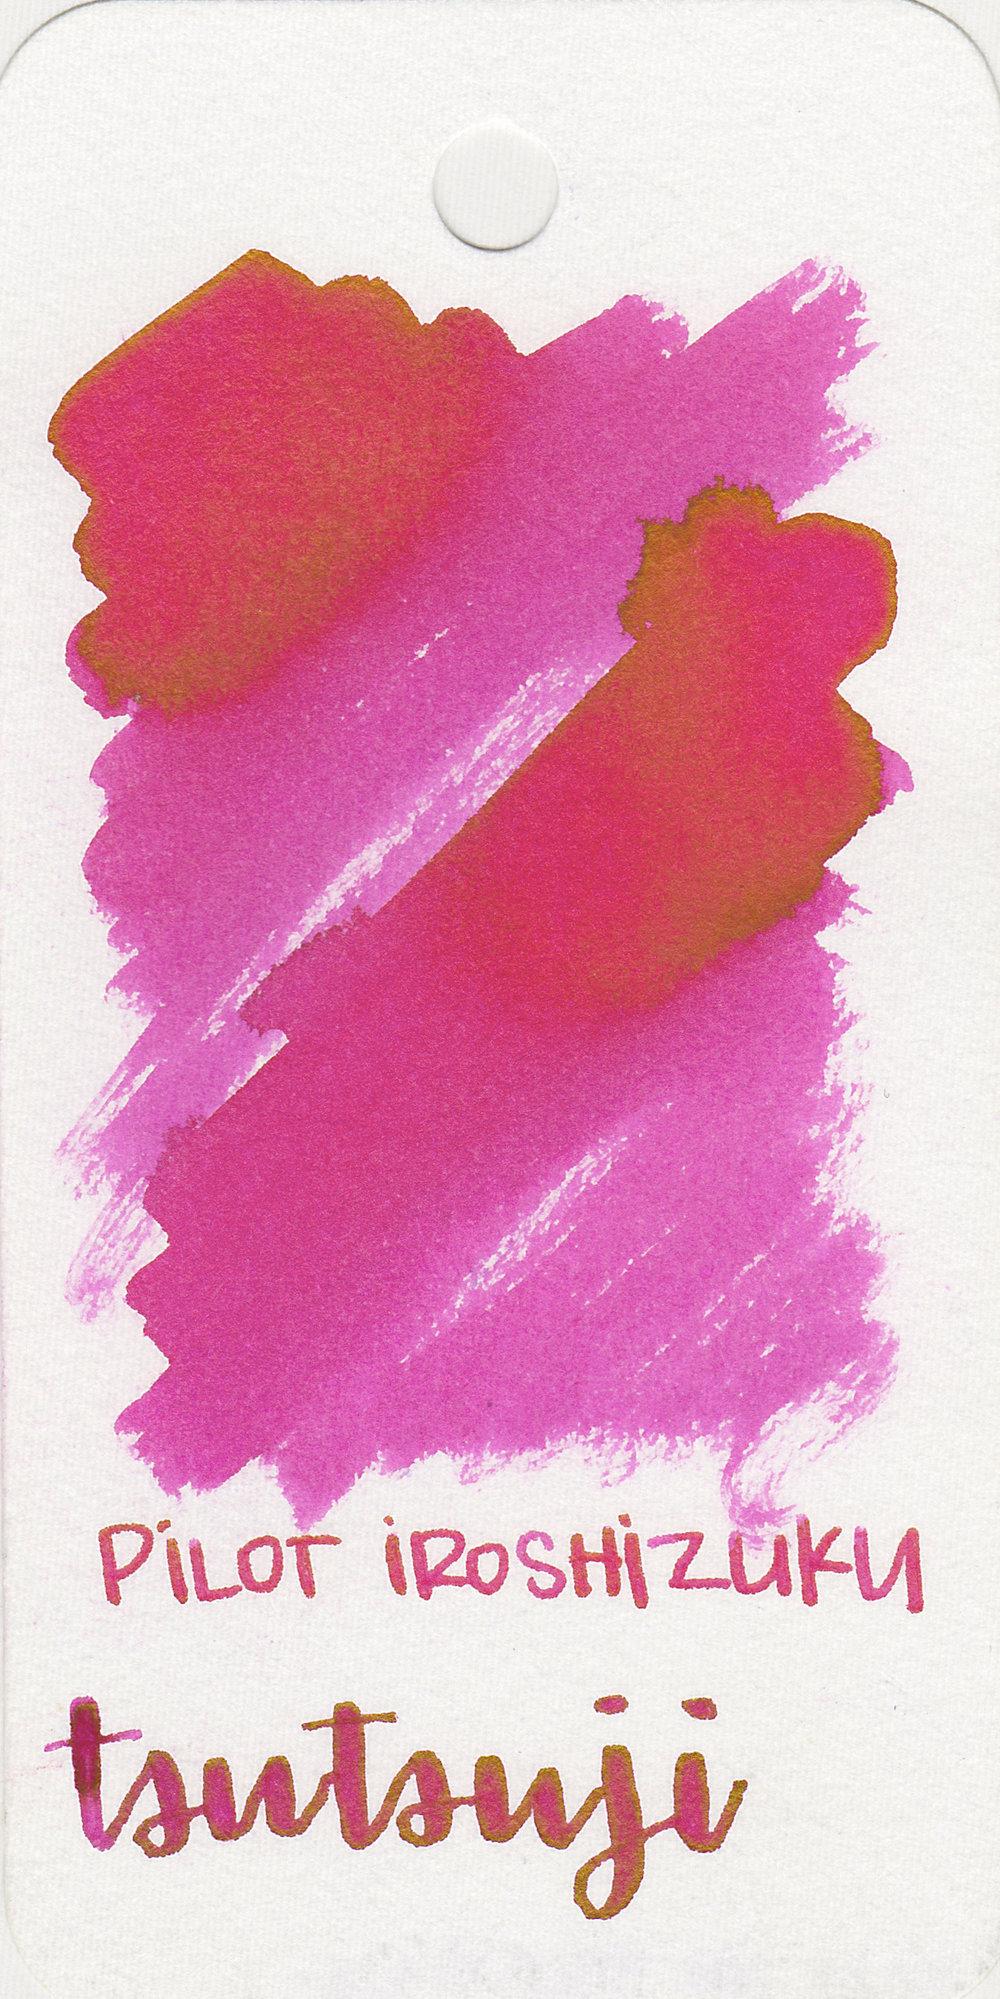 The color: - Tsutsuji is a bright, vibrant pink.